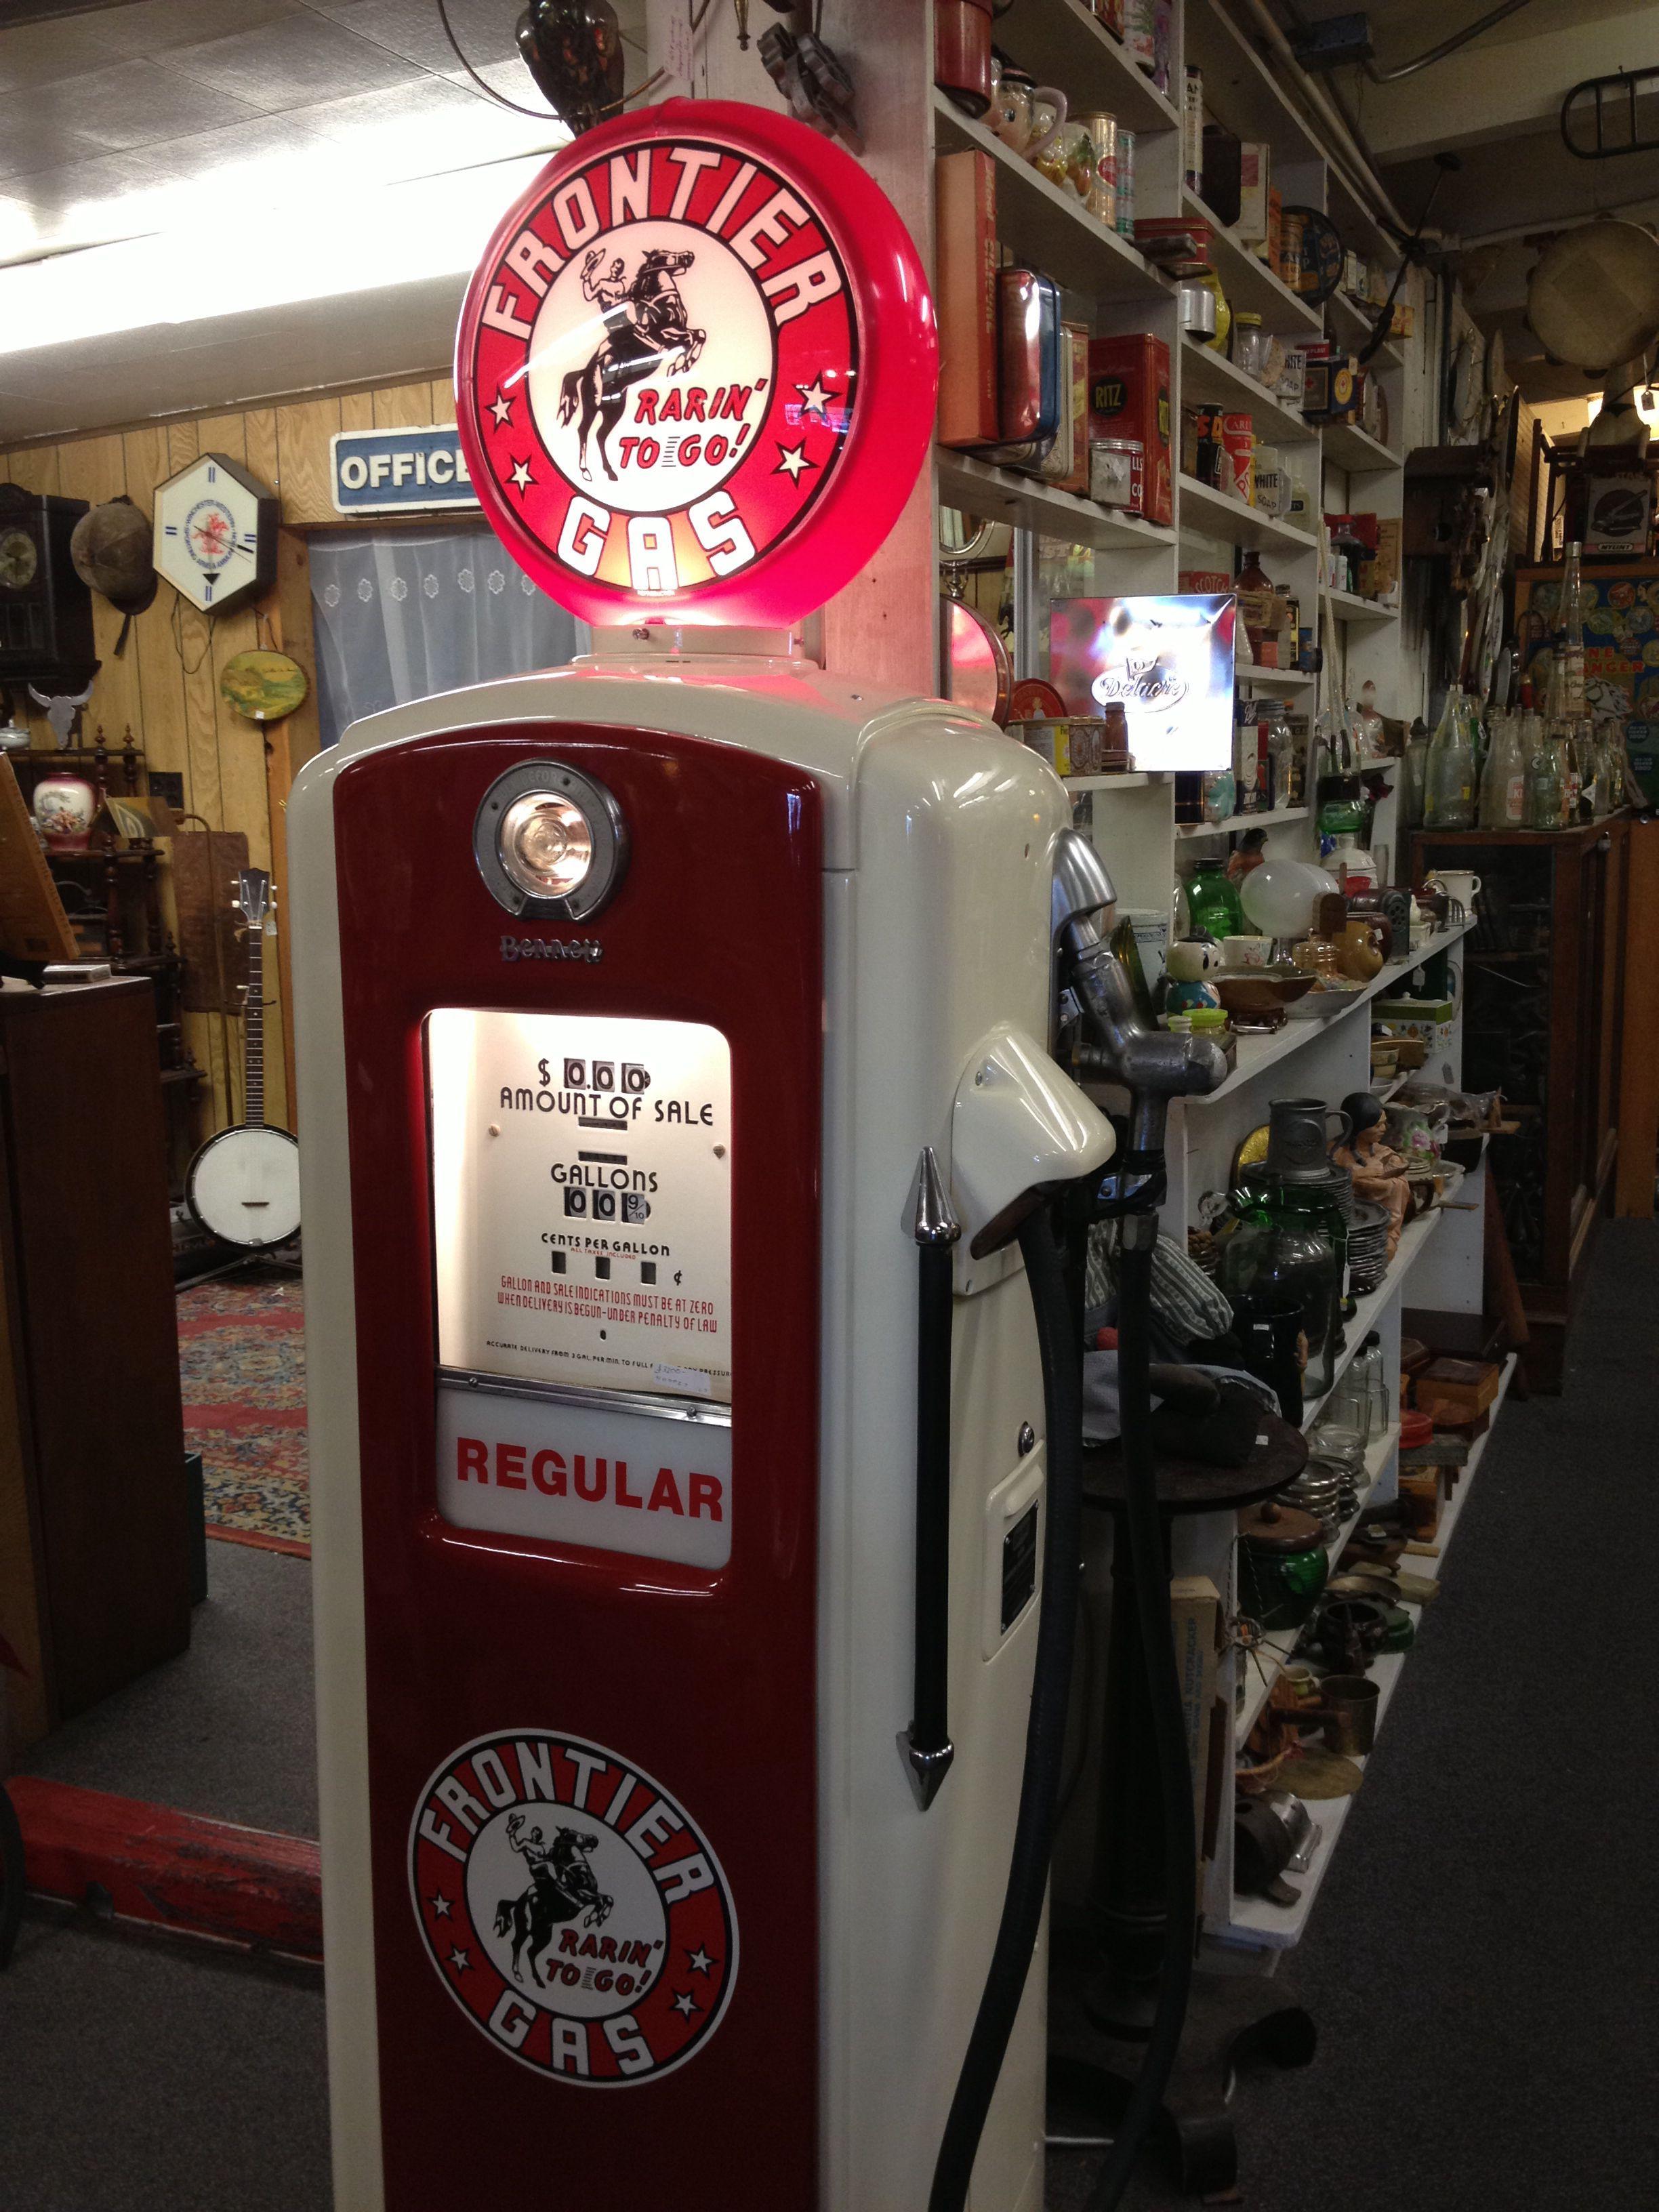 Pin by john flick on vintage gas pumps vintage gas pumps